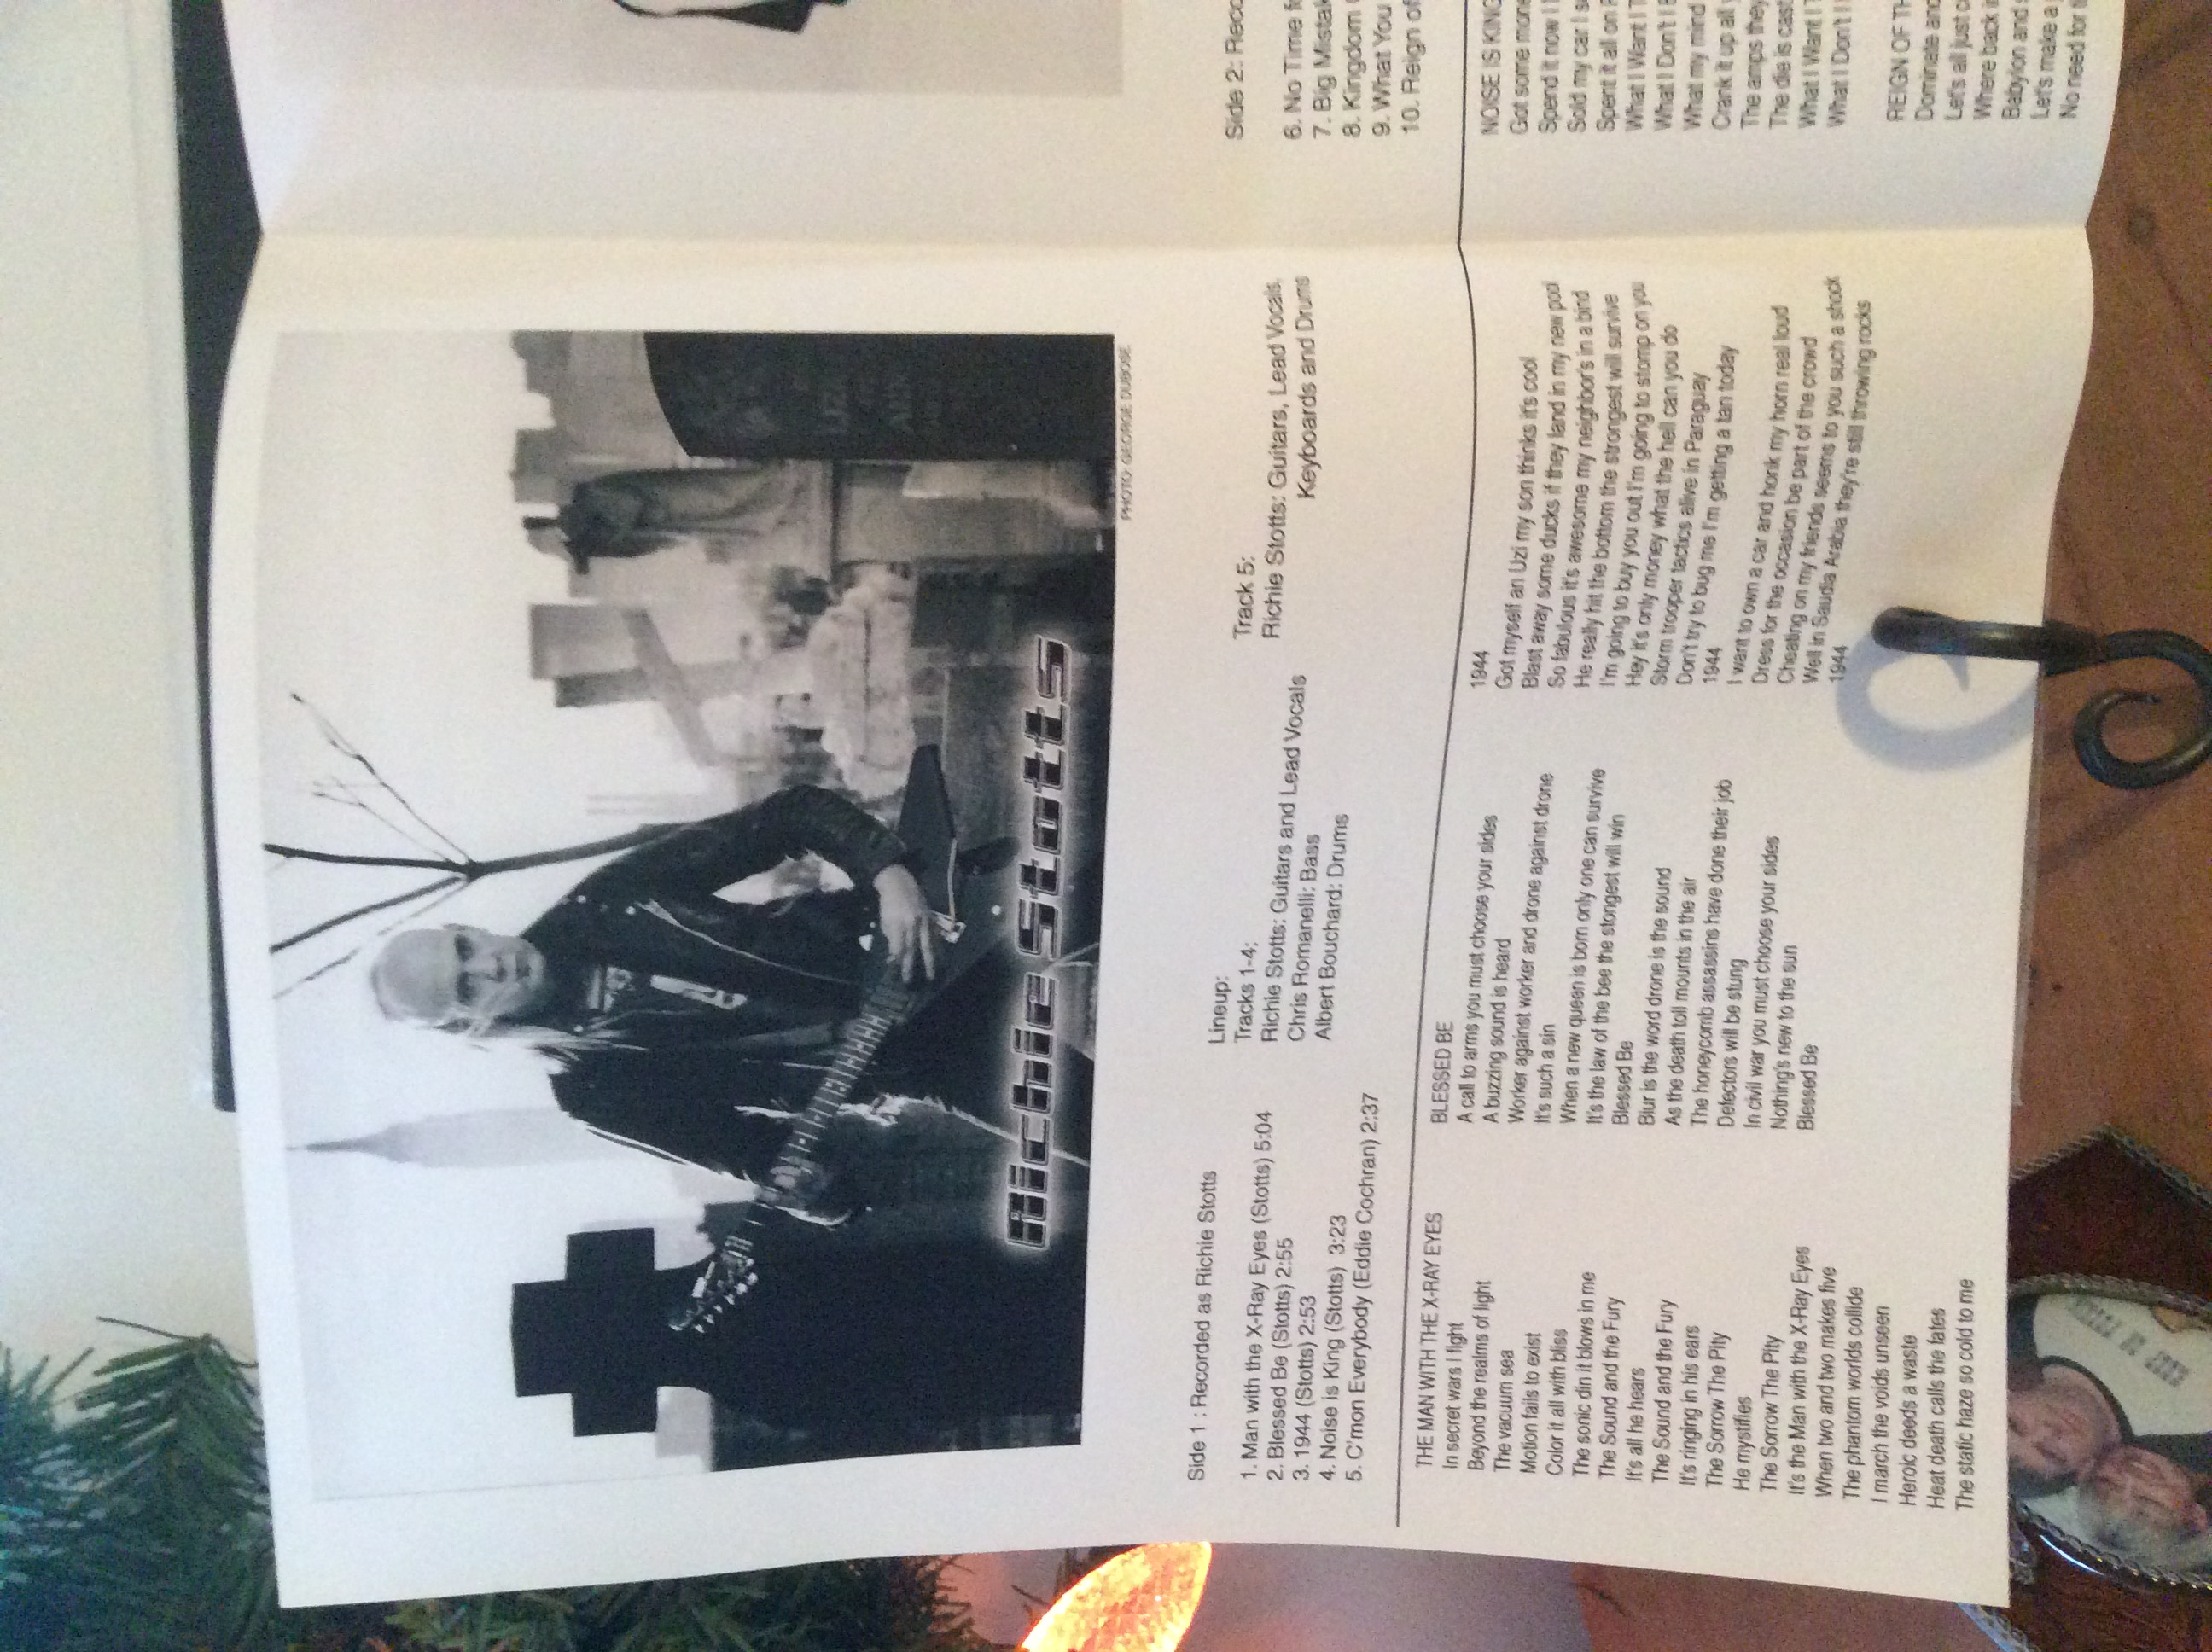 Richie Stotts Richie Stotts Limited Edition 100 Copies